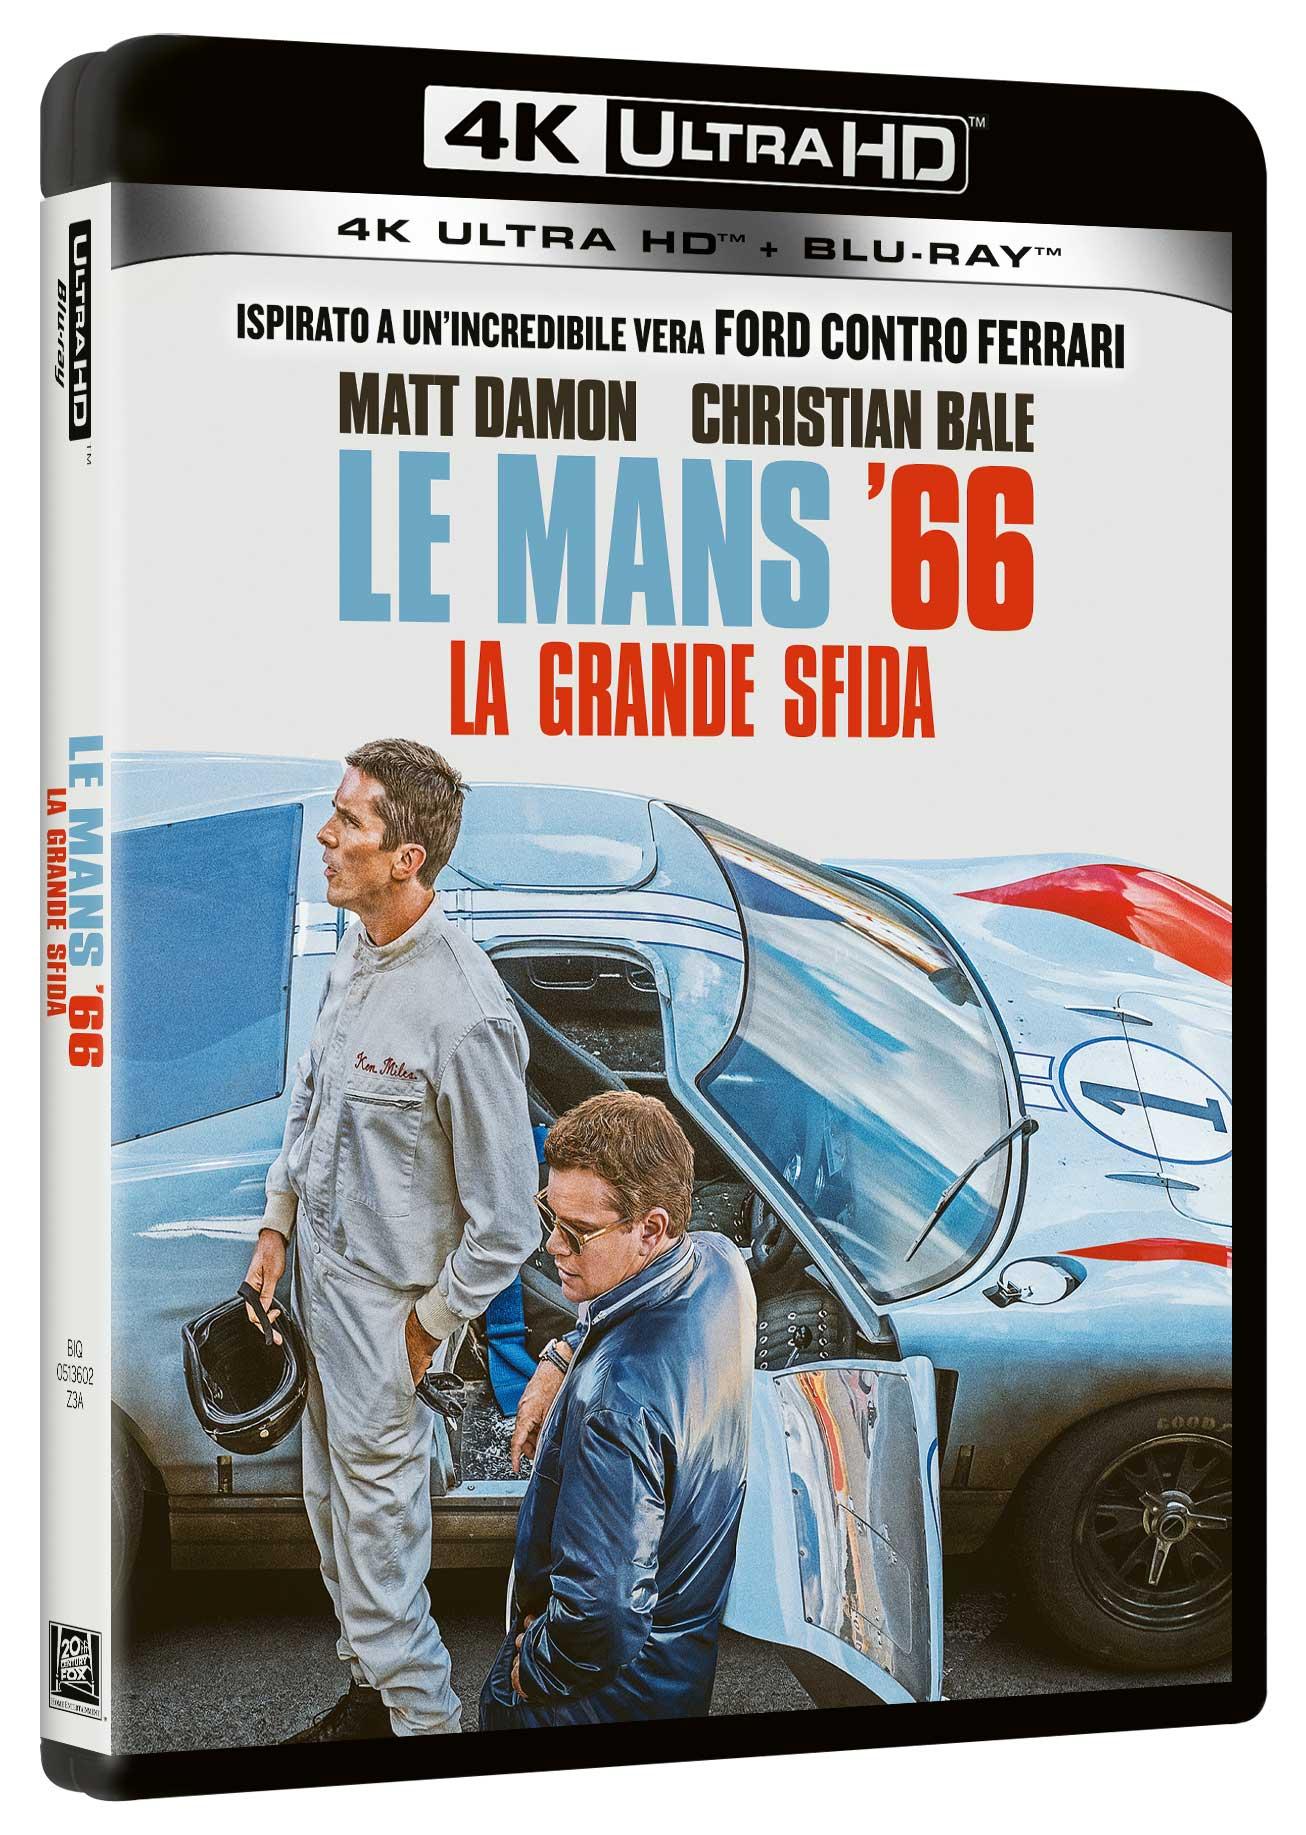 LE MANS 66 - LA GRANDE SFIDA (BLU-RAY 4K ULTRA HD+BLU-RAY)